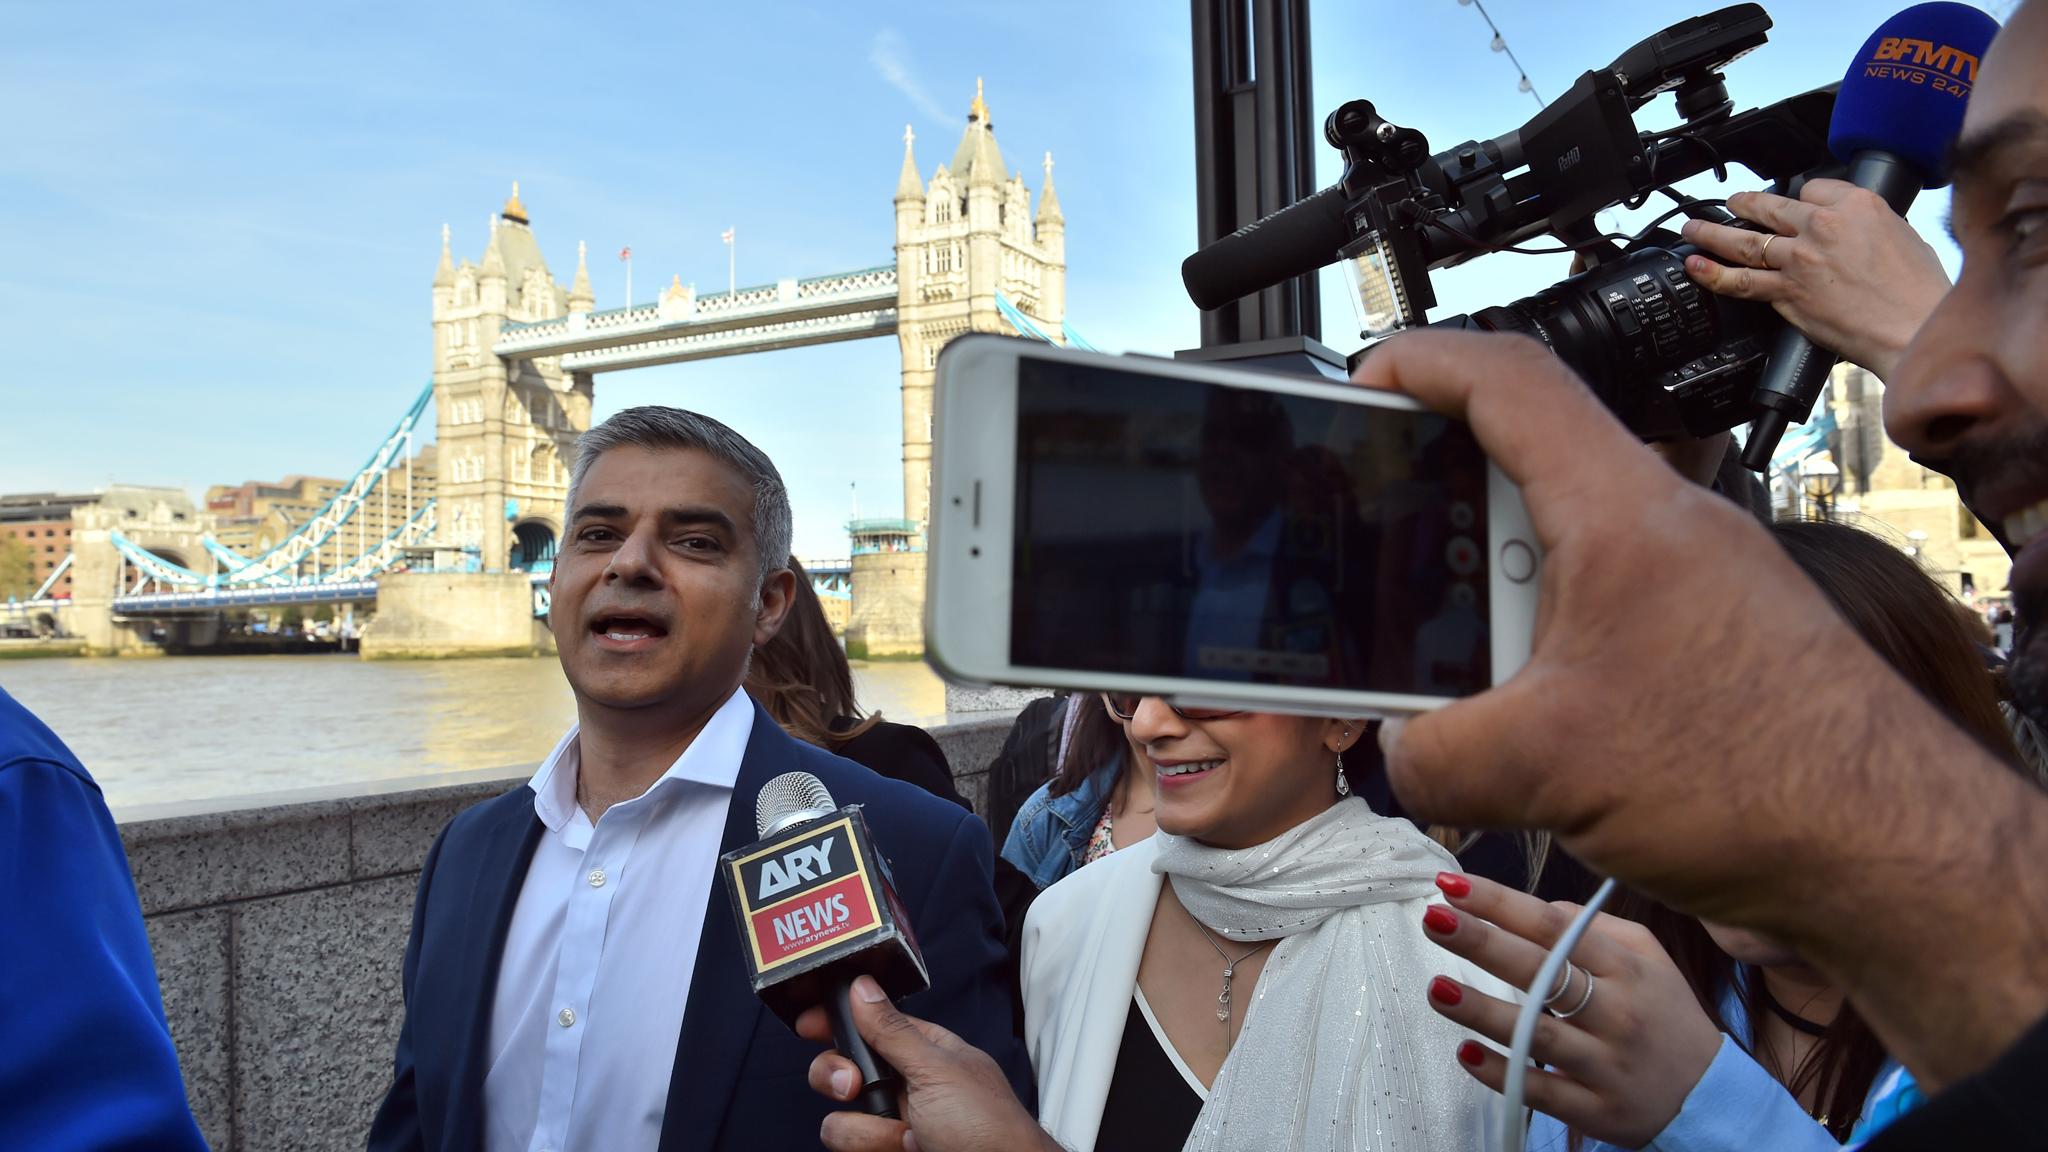 Victory for Sadiq Khan highlights tolerant face of London